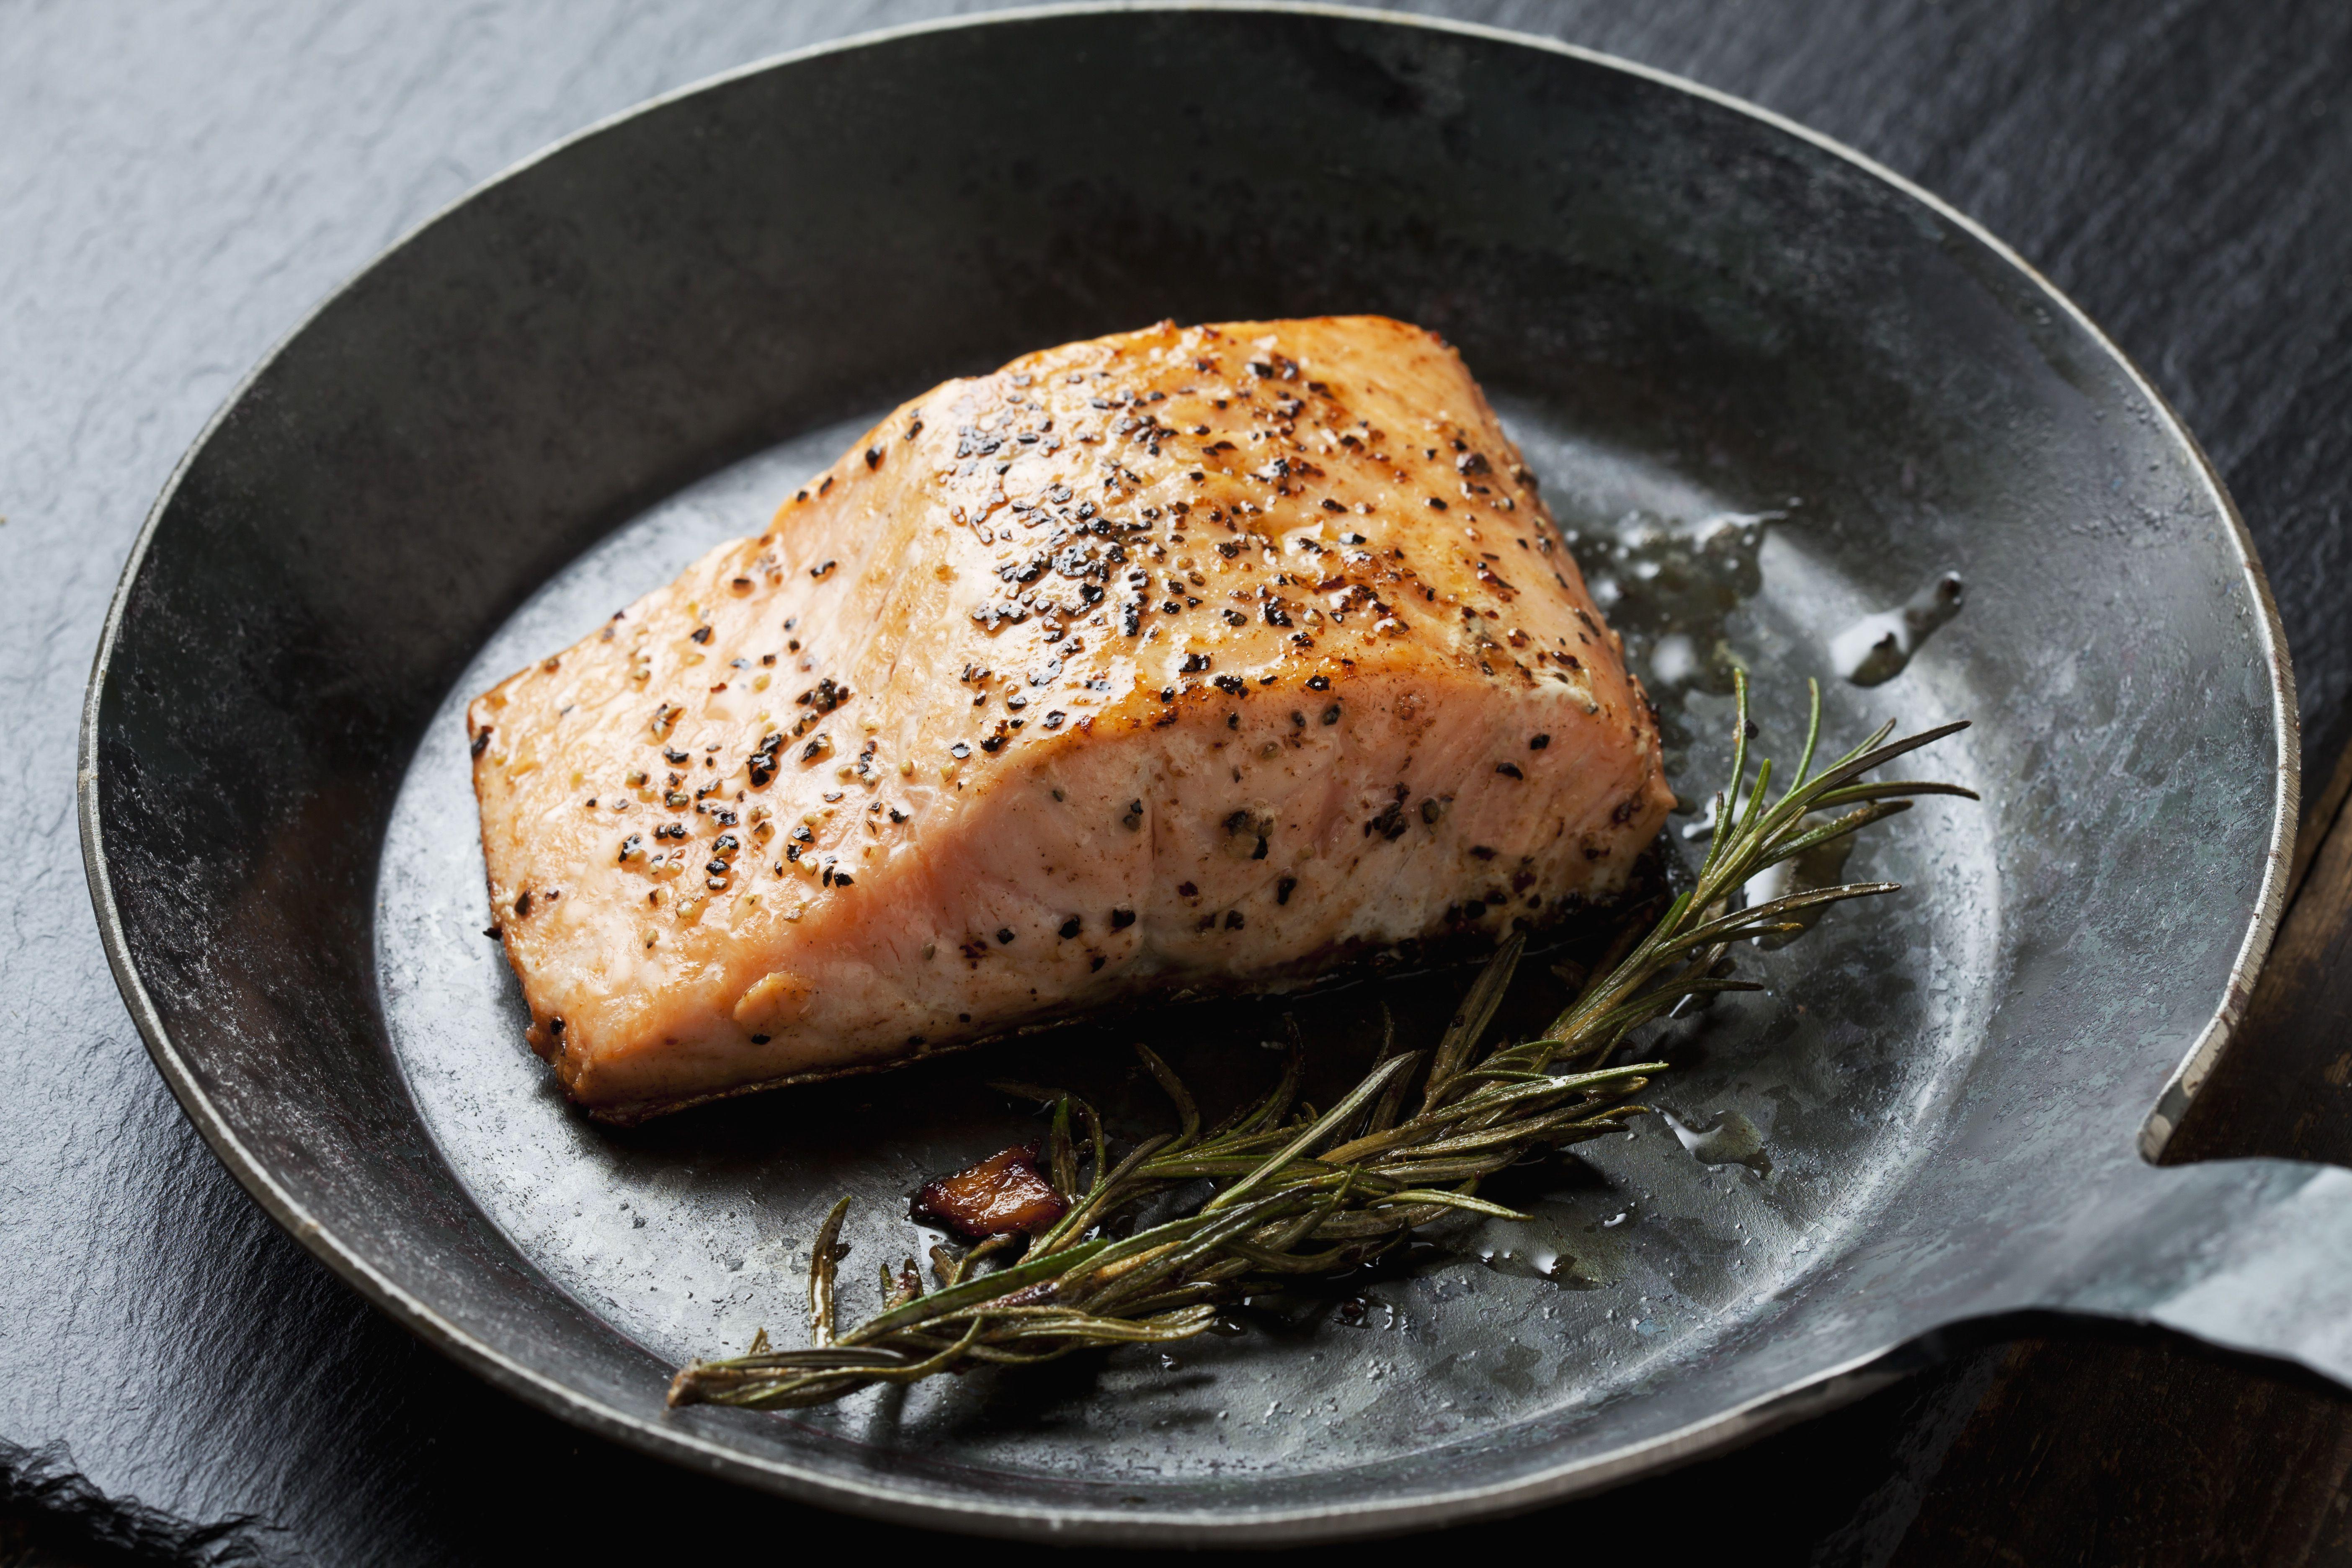 Fried salmon fillet in a frying pan